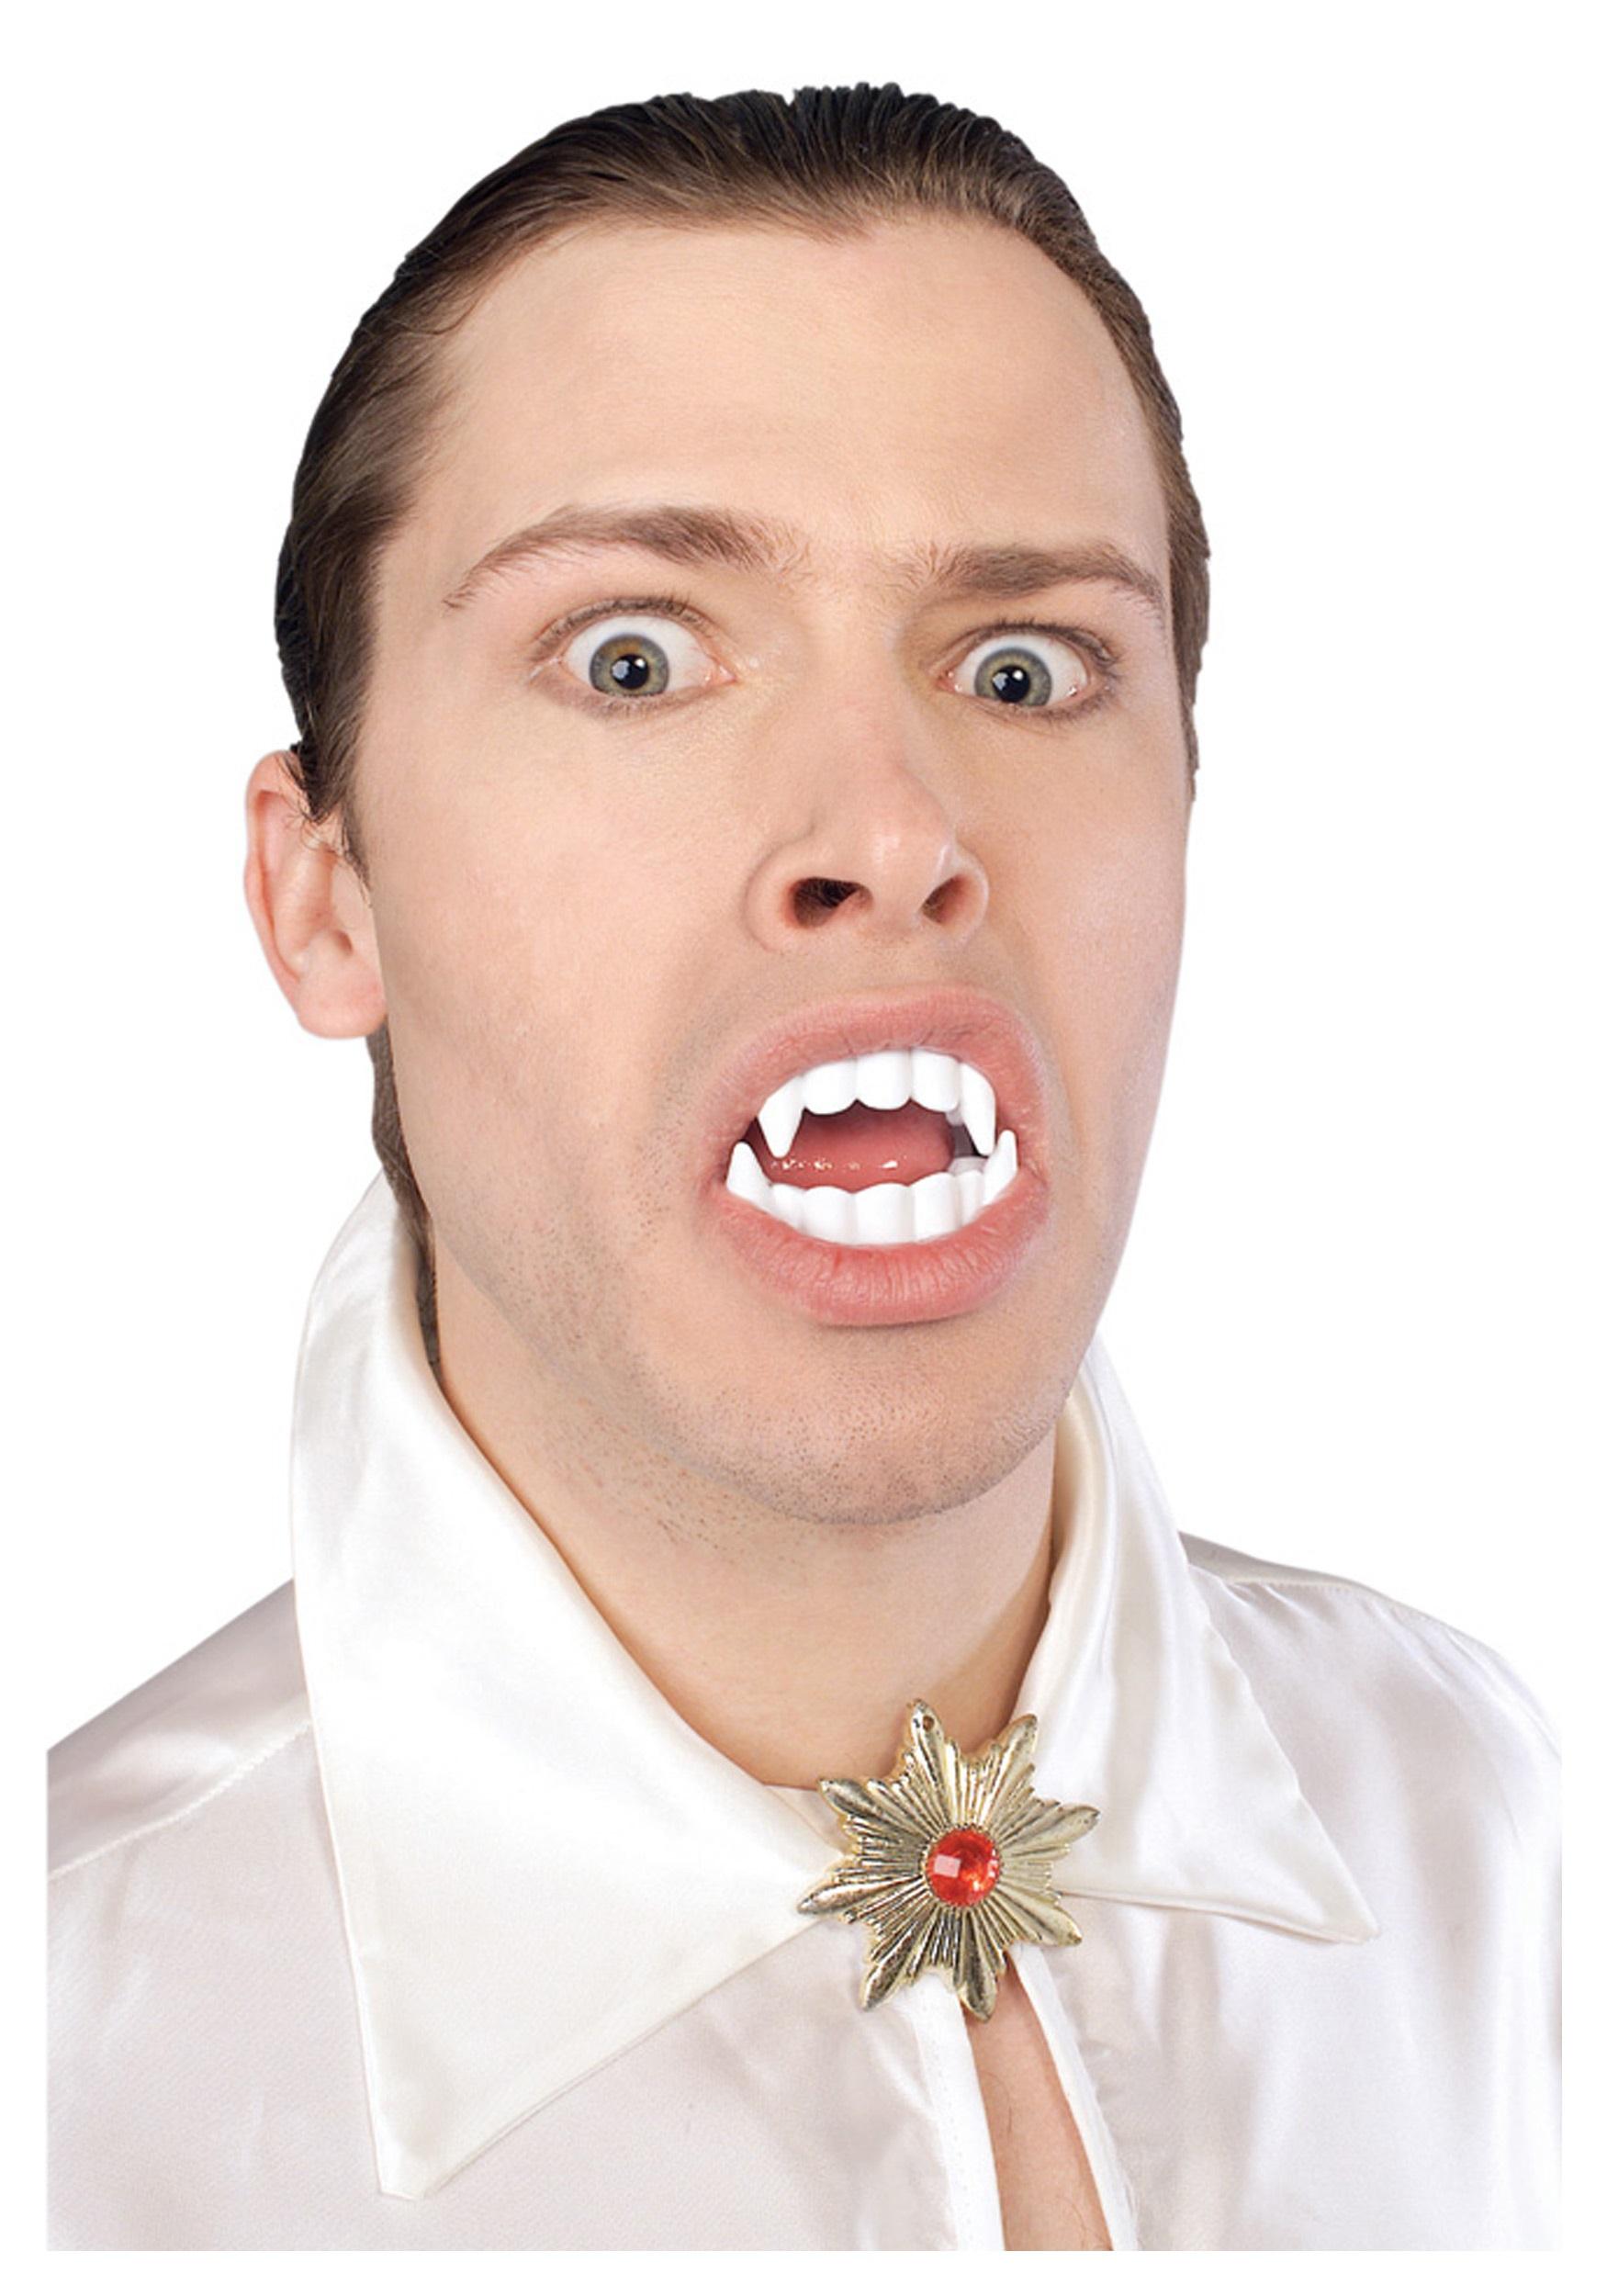 Cheap Vampire Fangs - Halloween Costume Classic Vampire Teeth